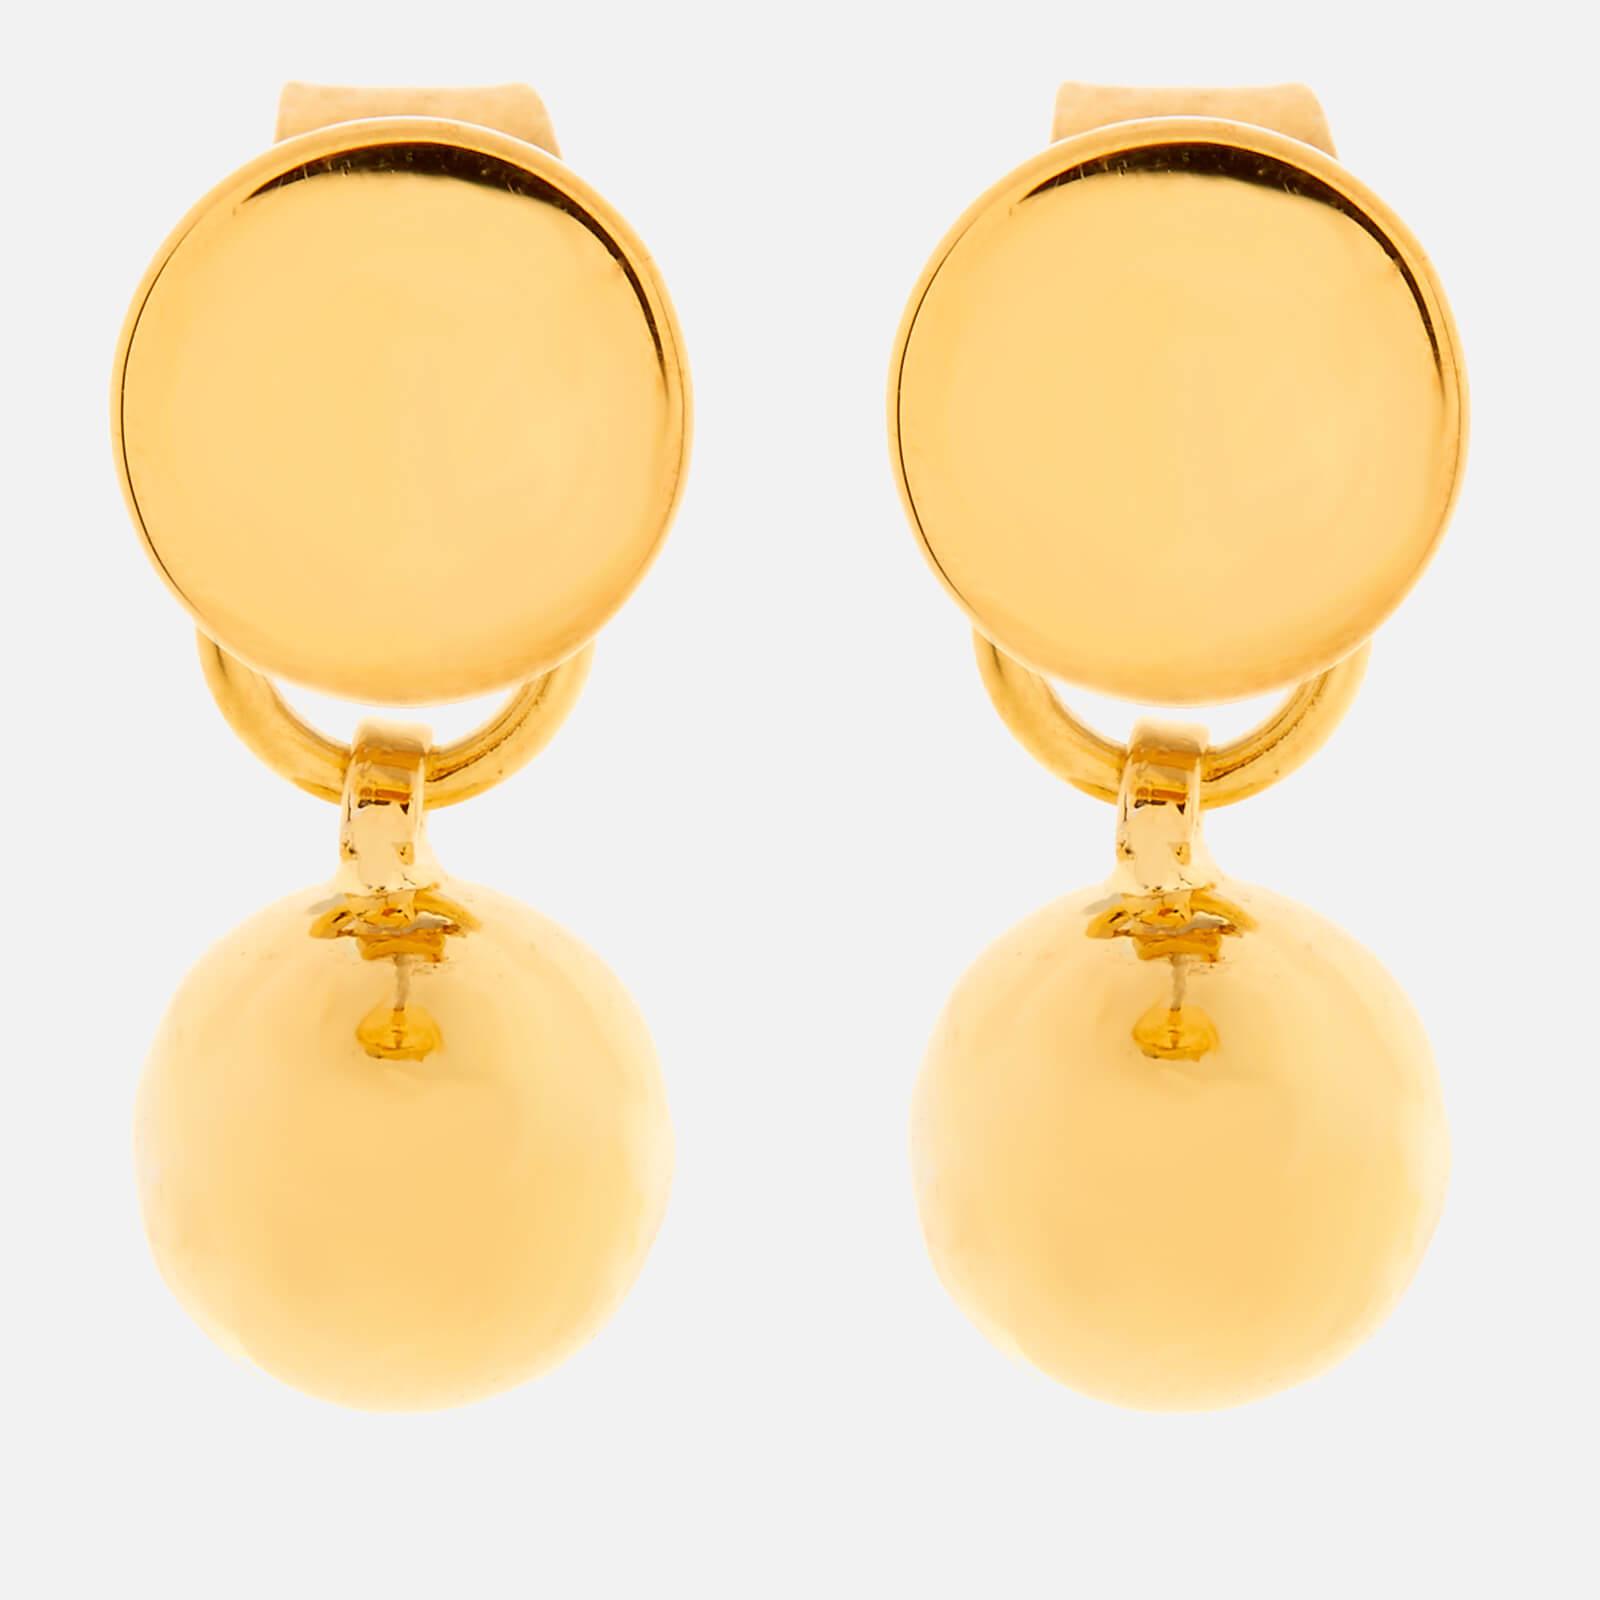 Whistles Women's Sphere Drop Back Earrings - Gold